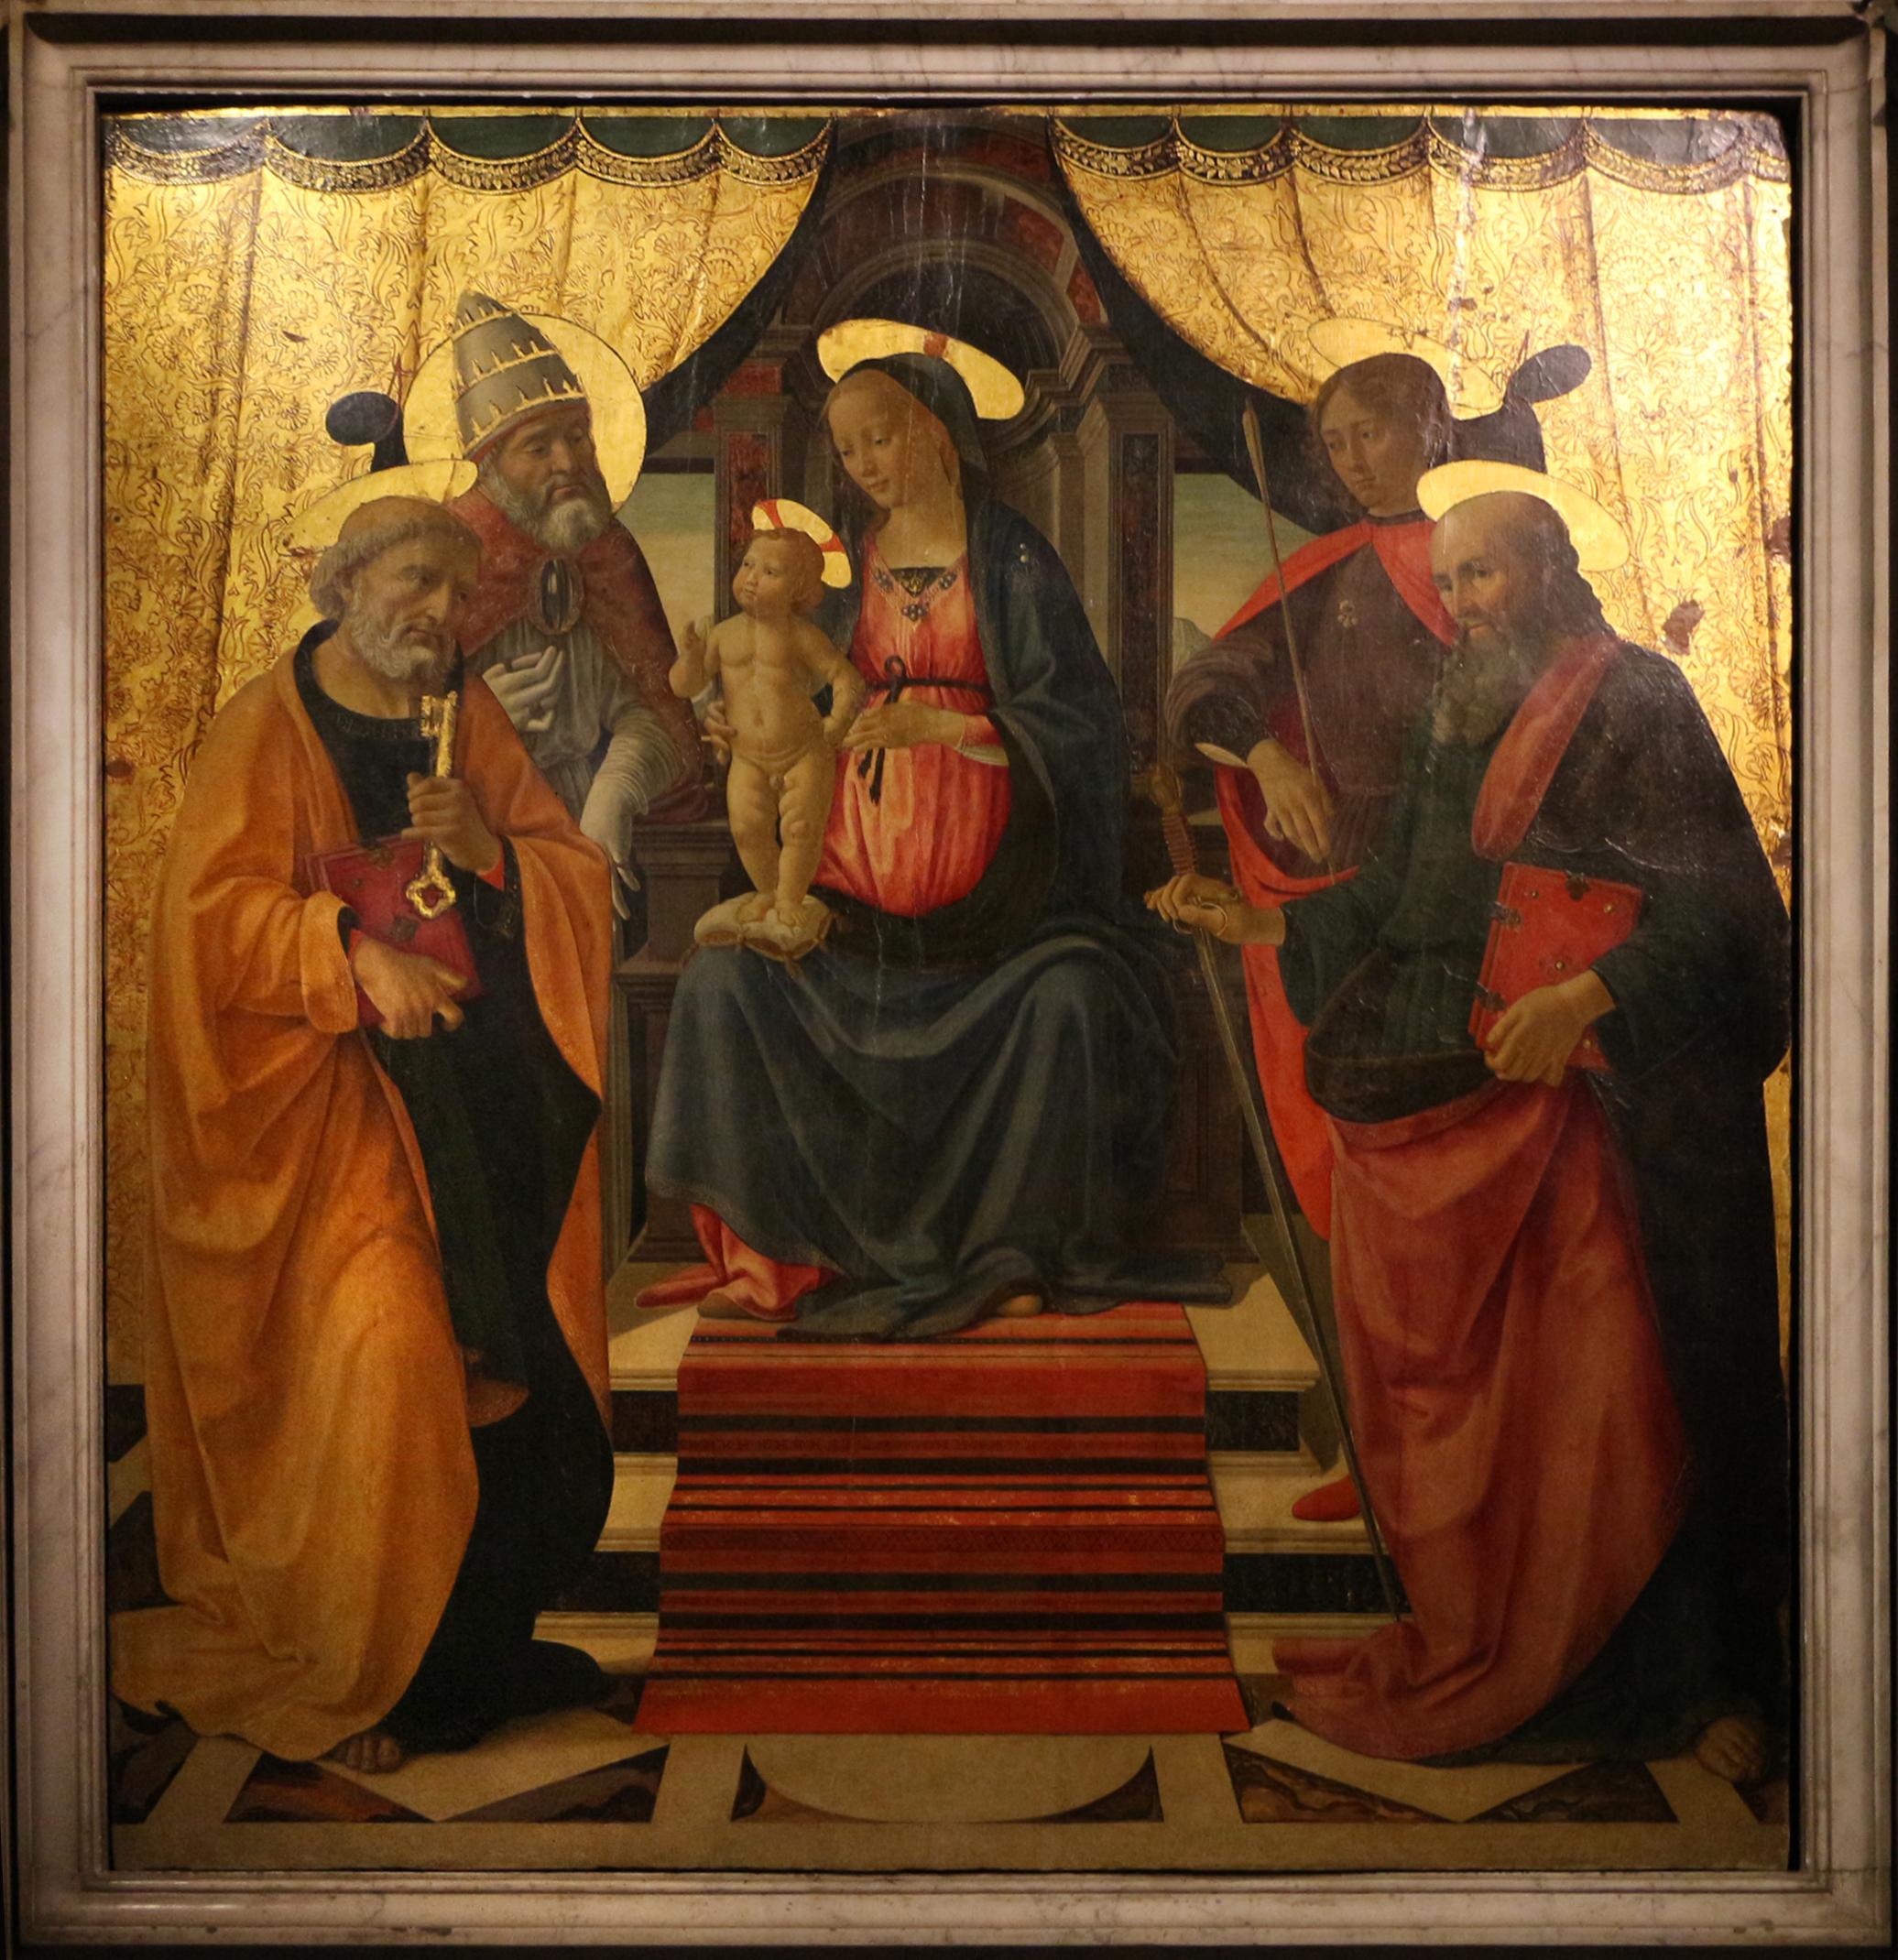 File:Domenico ghirlandaio, sacra conversazione di lucca, 1479, 02.JPG